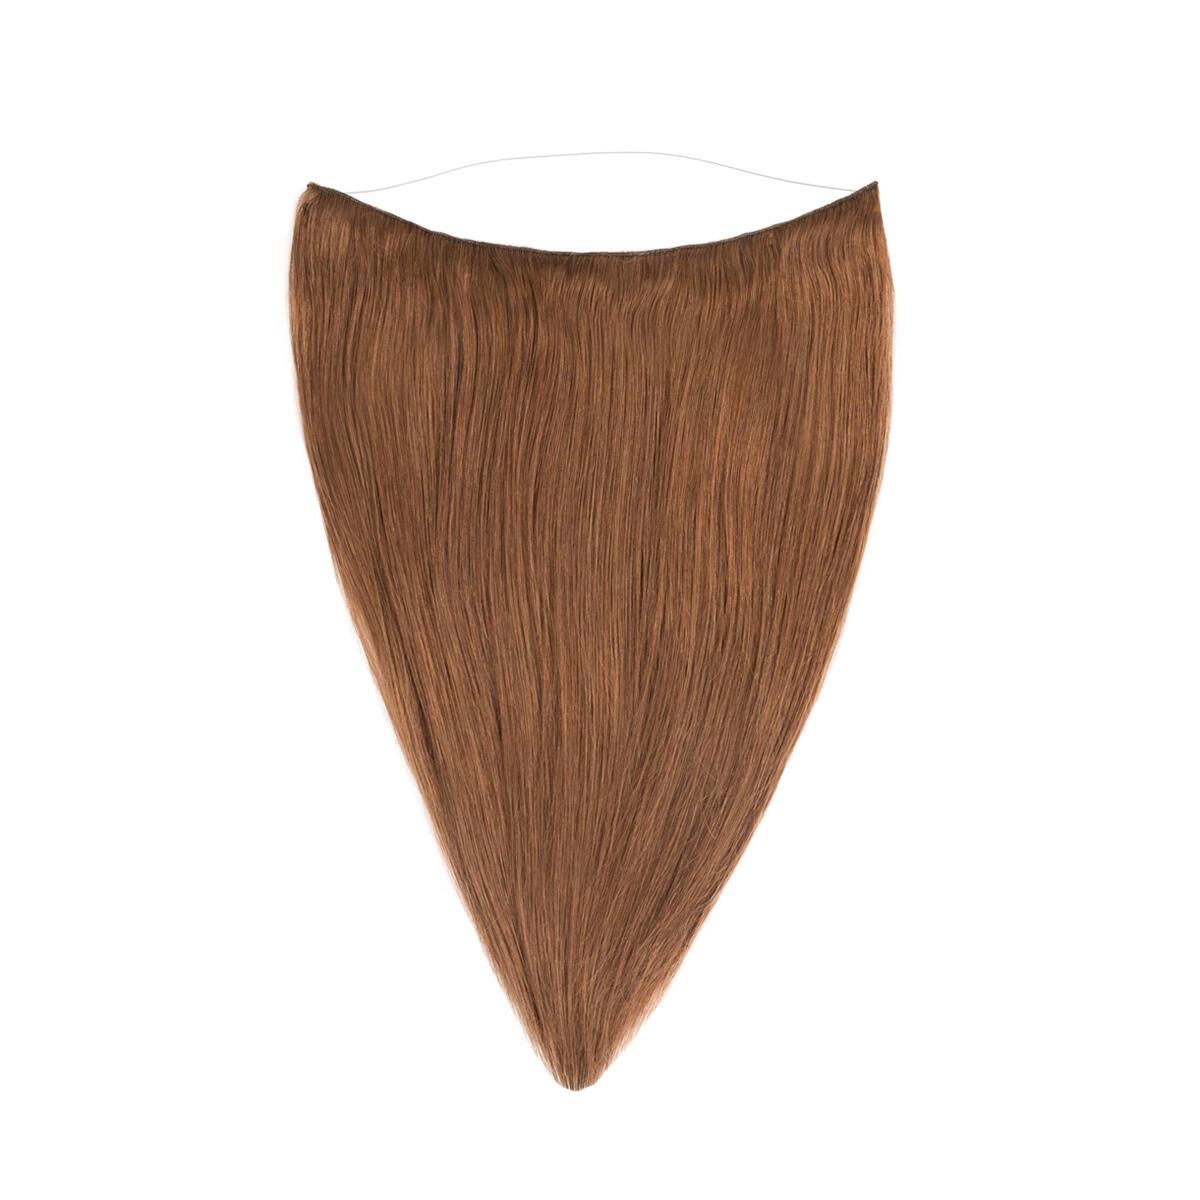 Hairband Original 5.0 Brown 45 cm